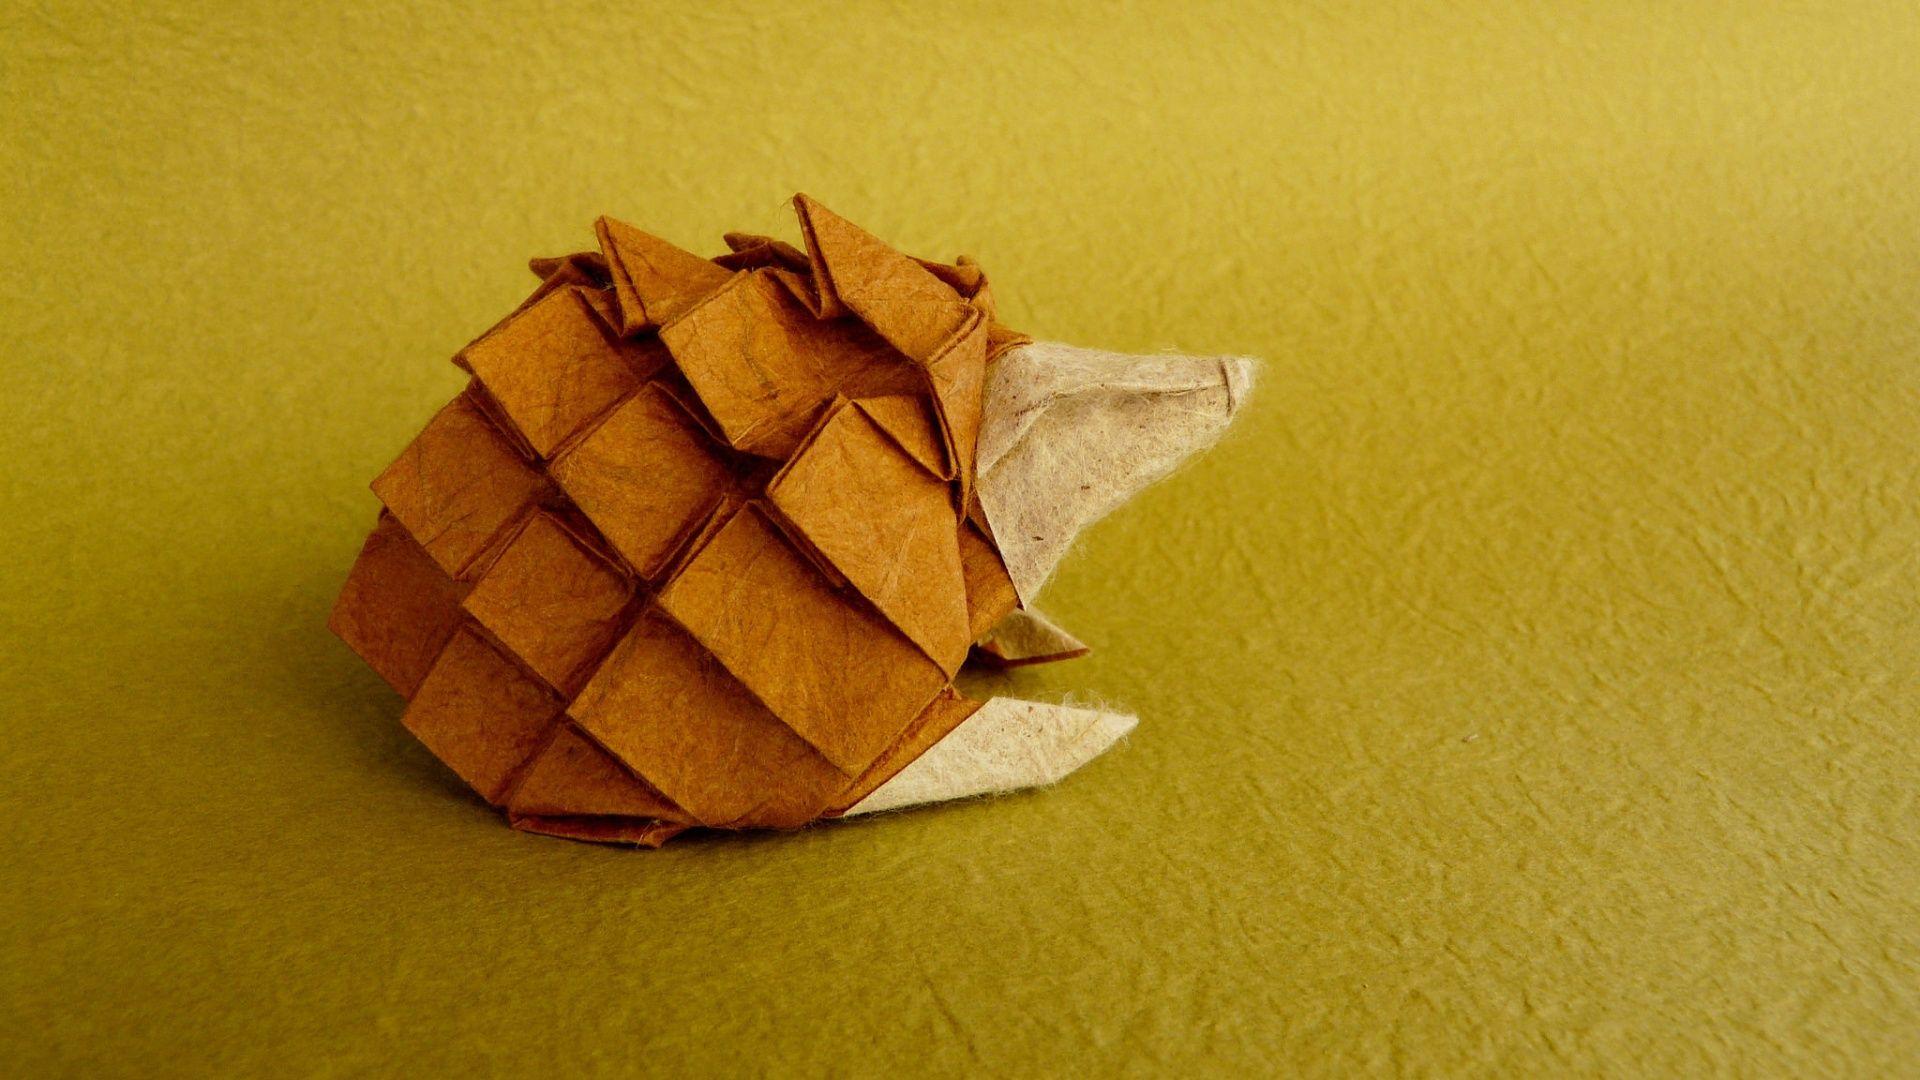 Origami full hd wallpaper